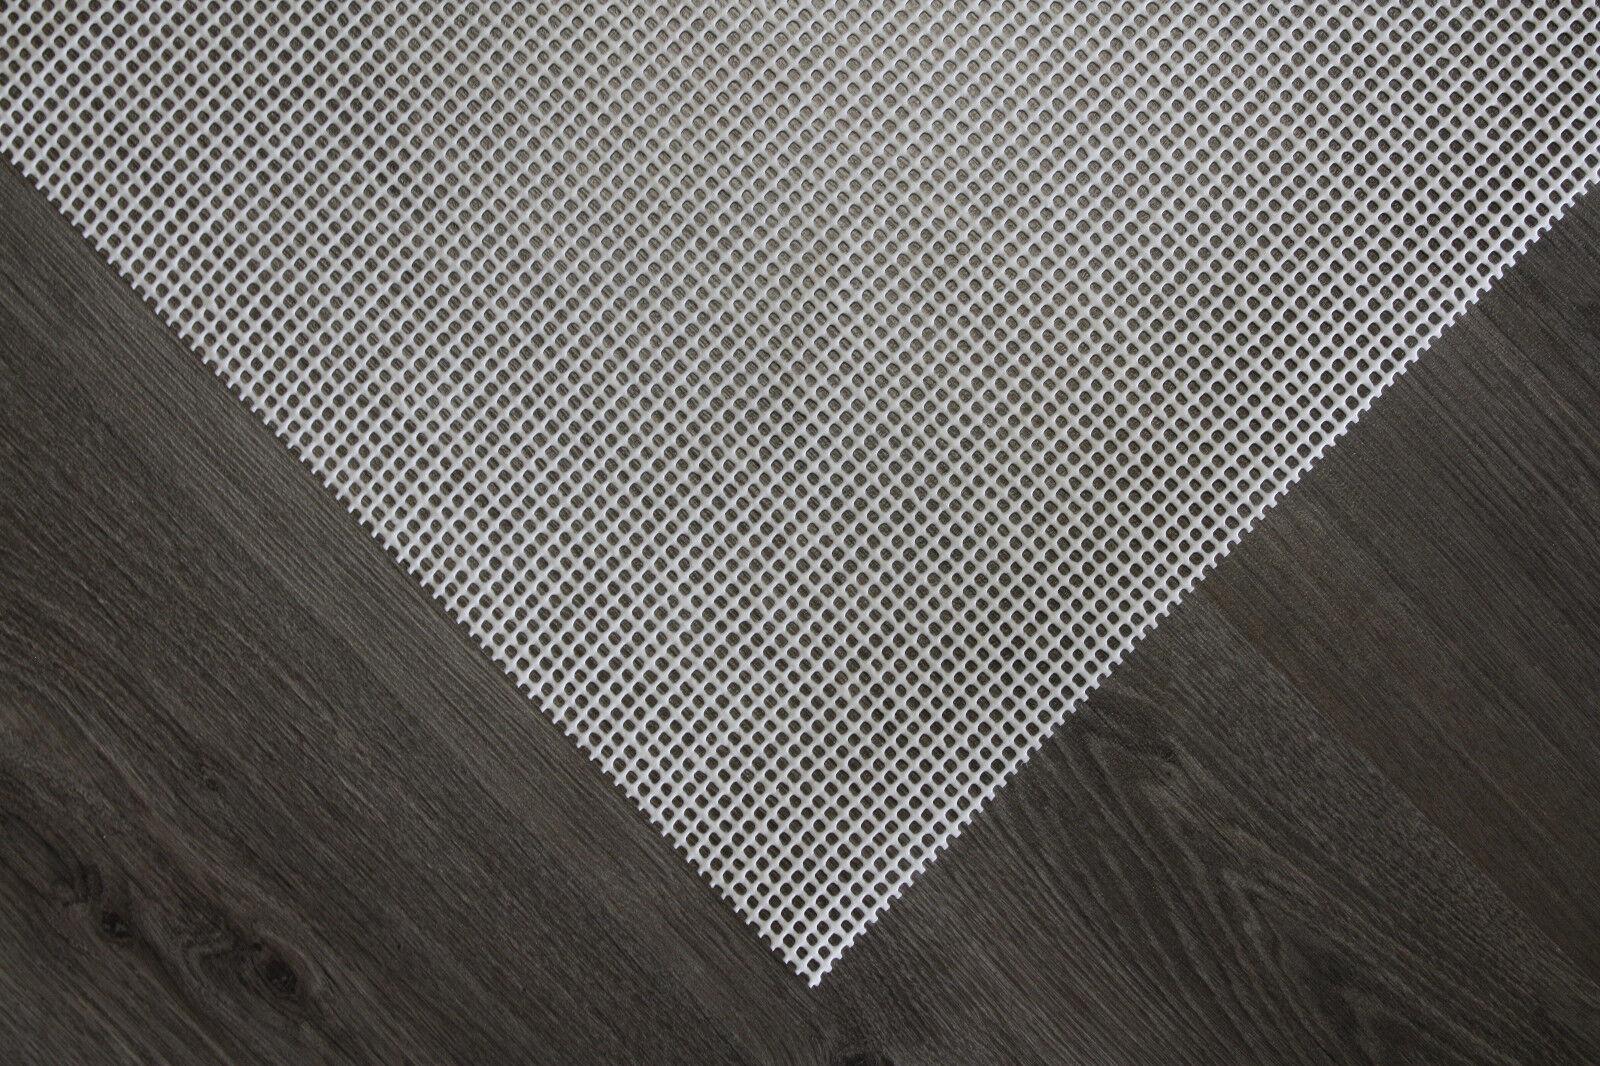 Stelton Concave Vase Medium, Blaumenvase, Blaumenvase, Blaumenvase, Blaumen Krug, Sand Matt, 14 cm, X-141 8f1ce0